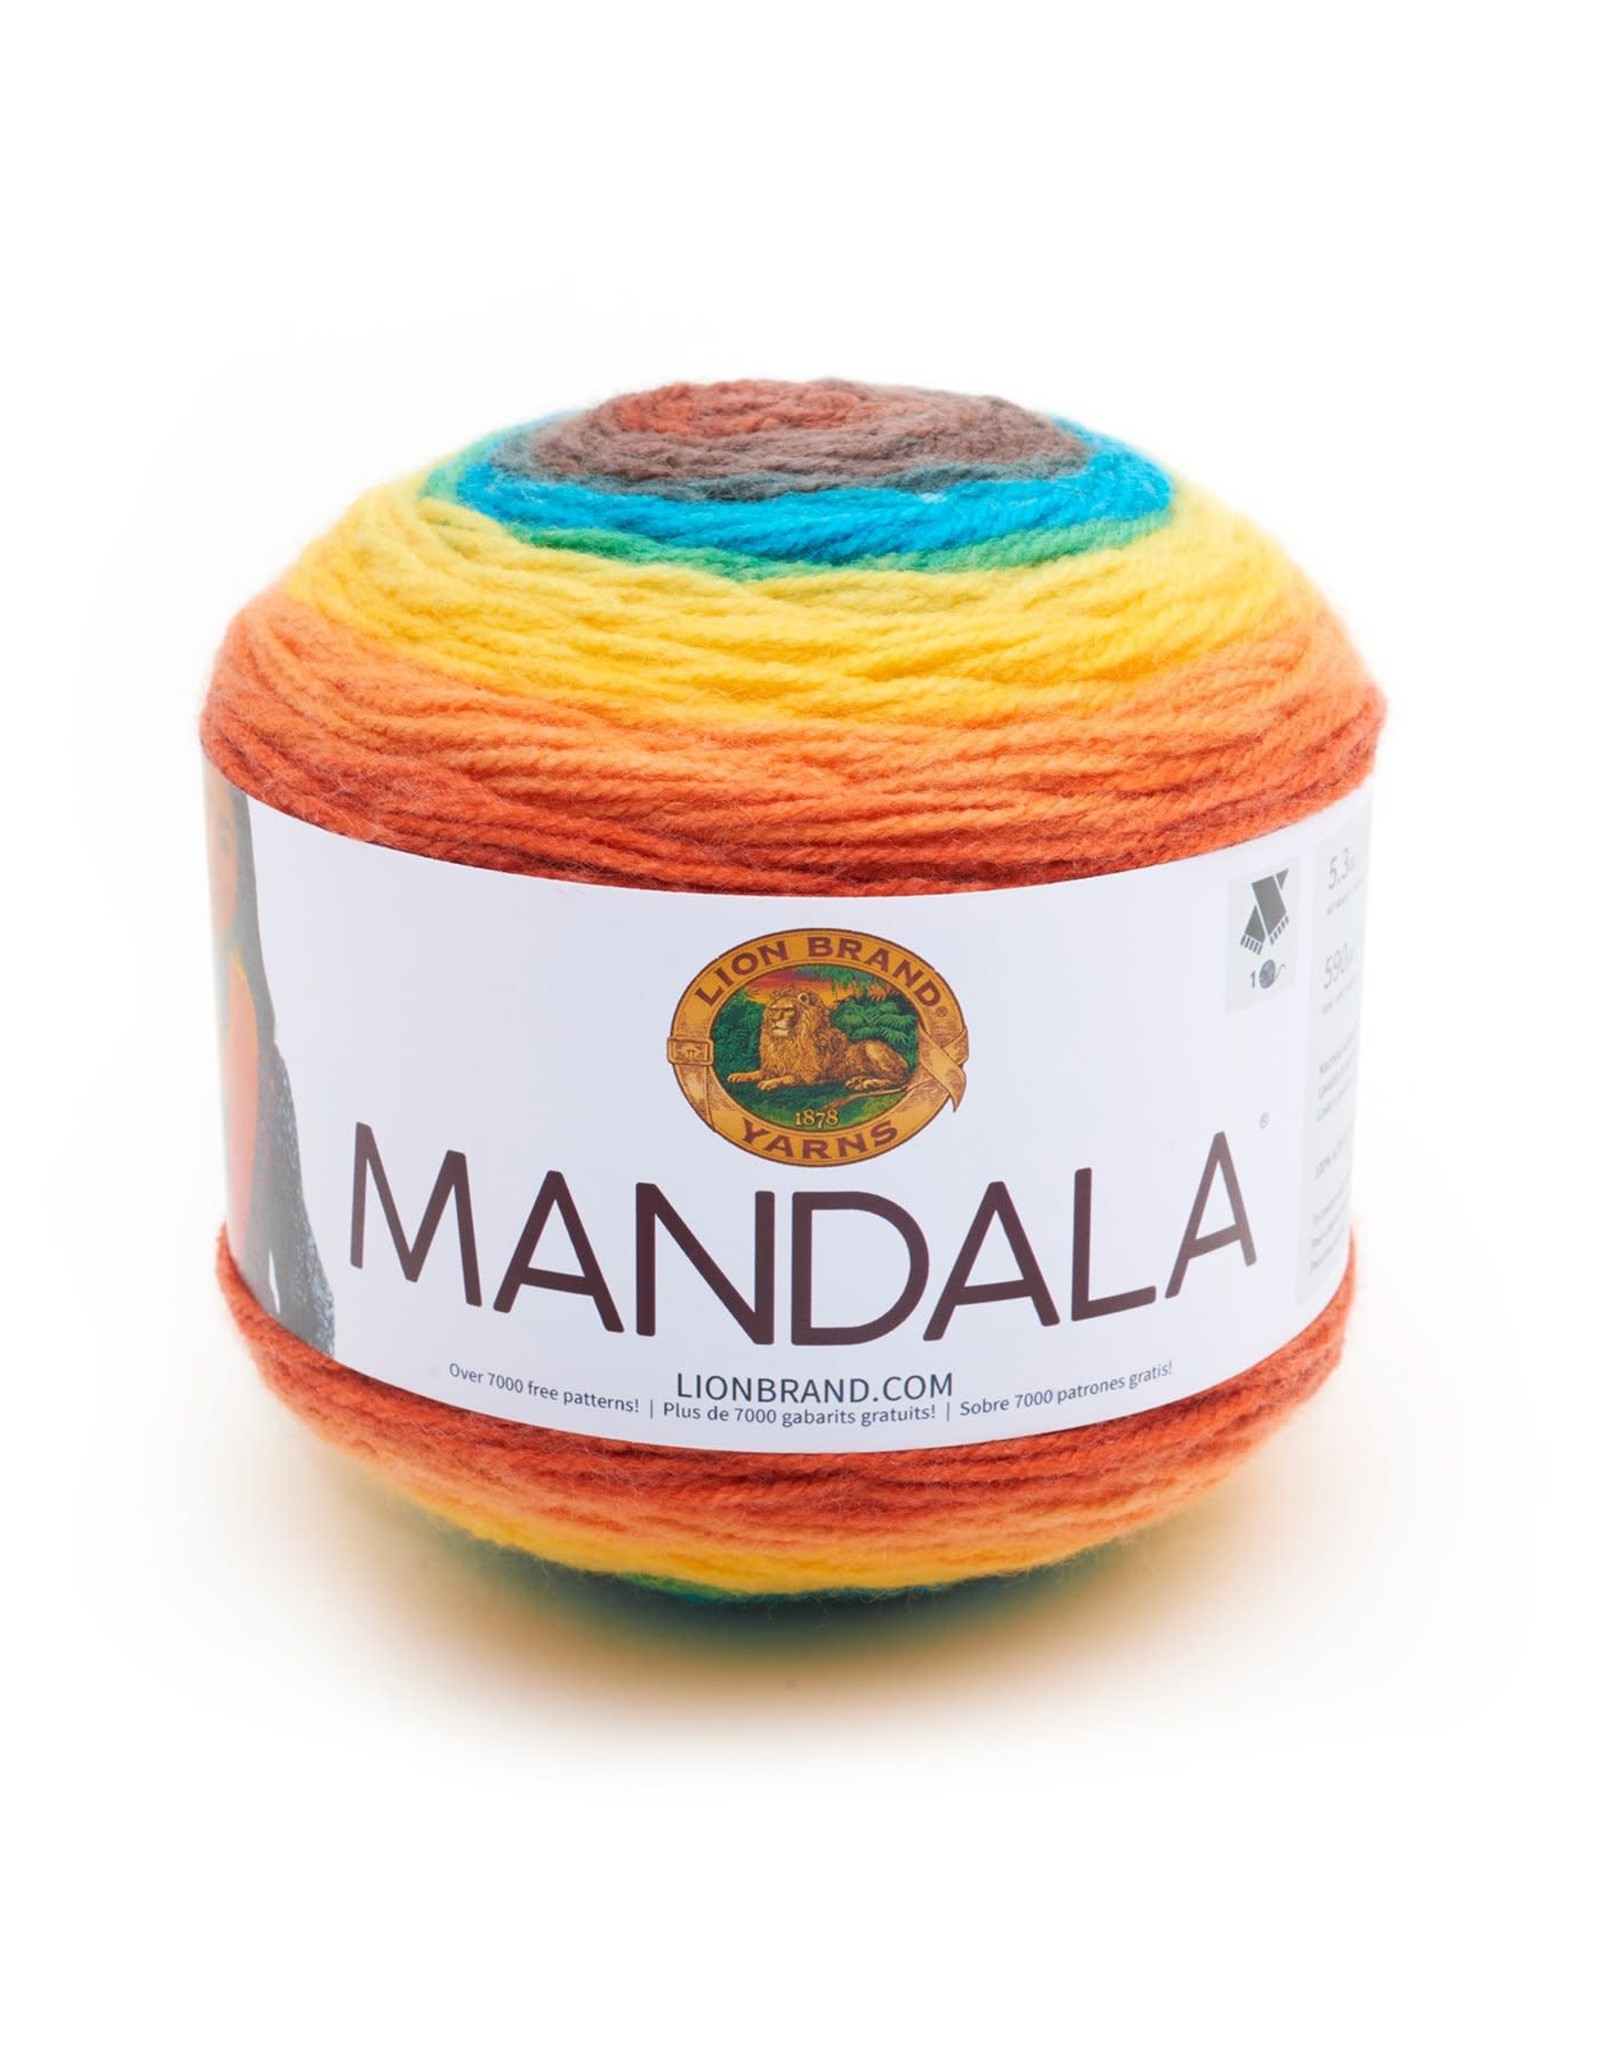 Thunderbird - Mandala - Lion Brand